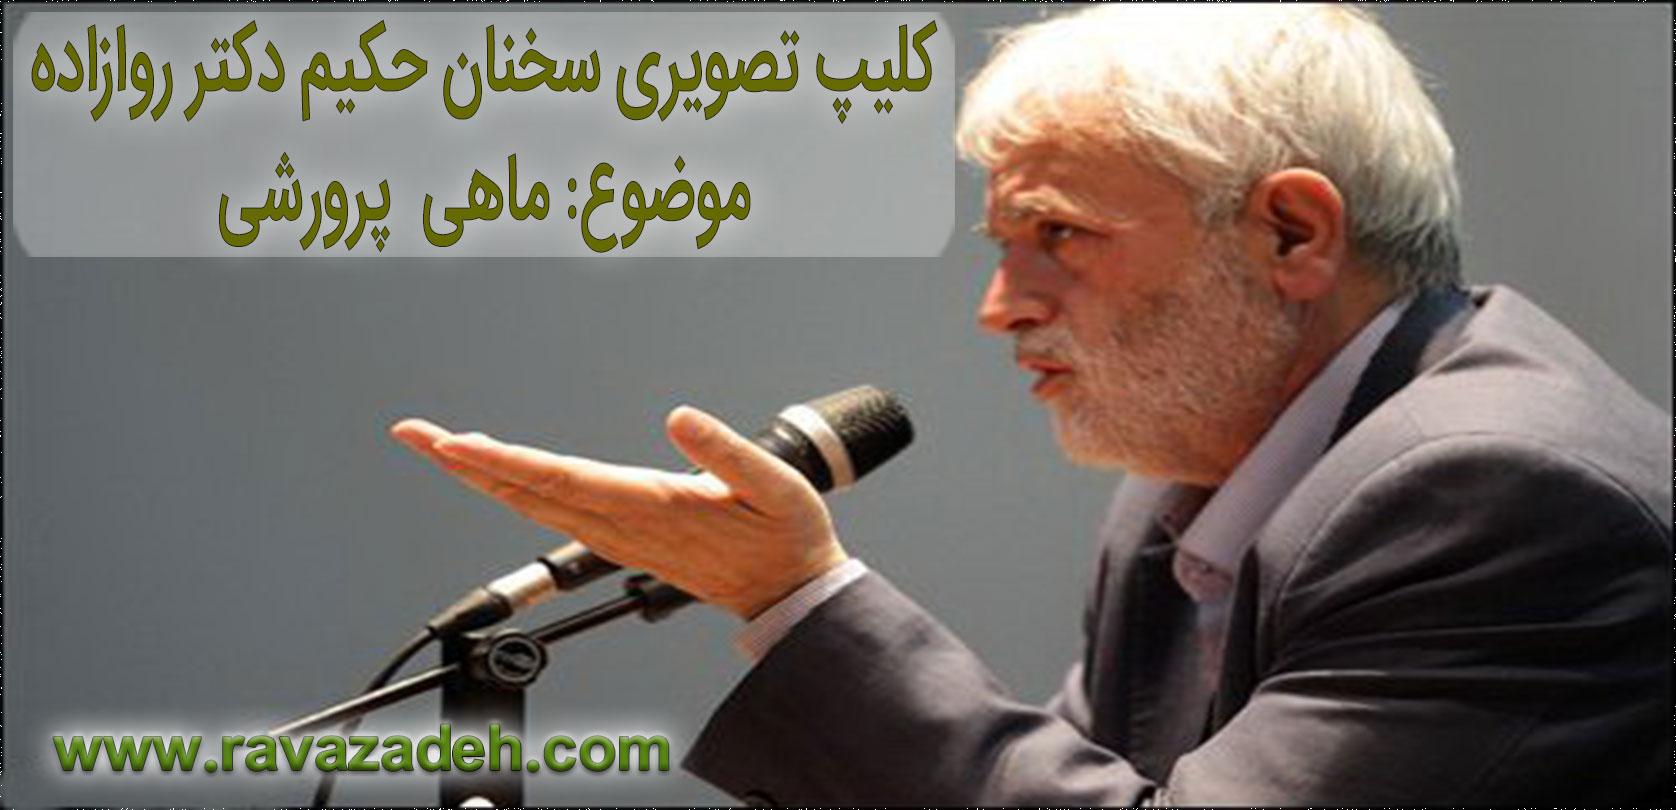 Photo of عدم تایید ماهی های پرورشی + کلیپ تصویری سخنرانی حکیم دکتر روازاده